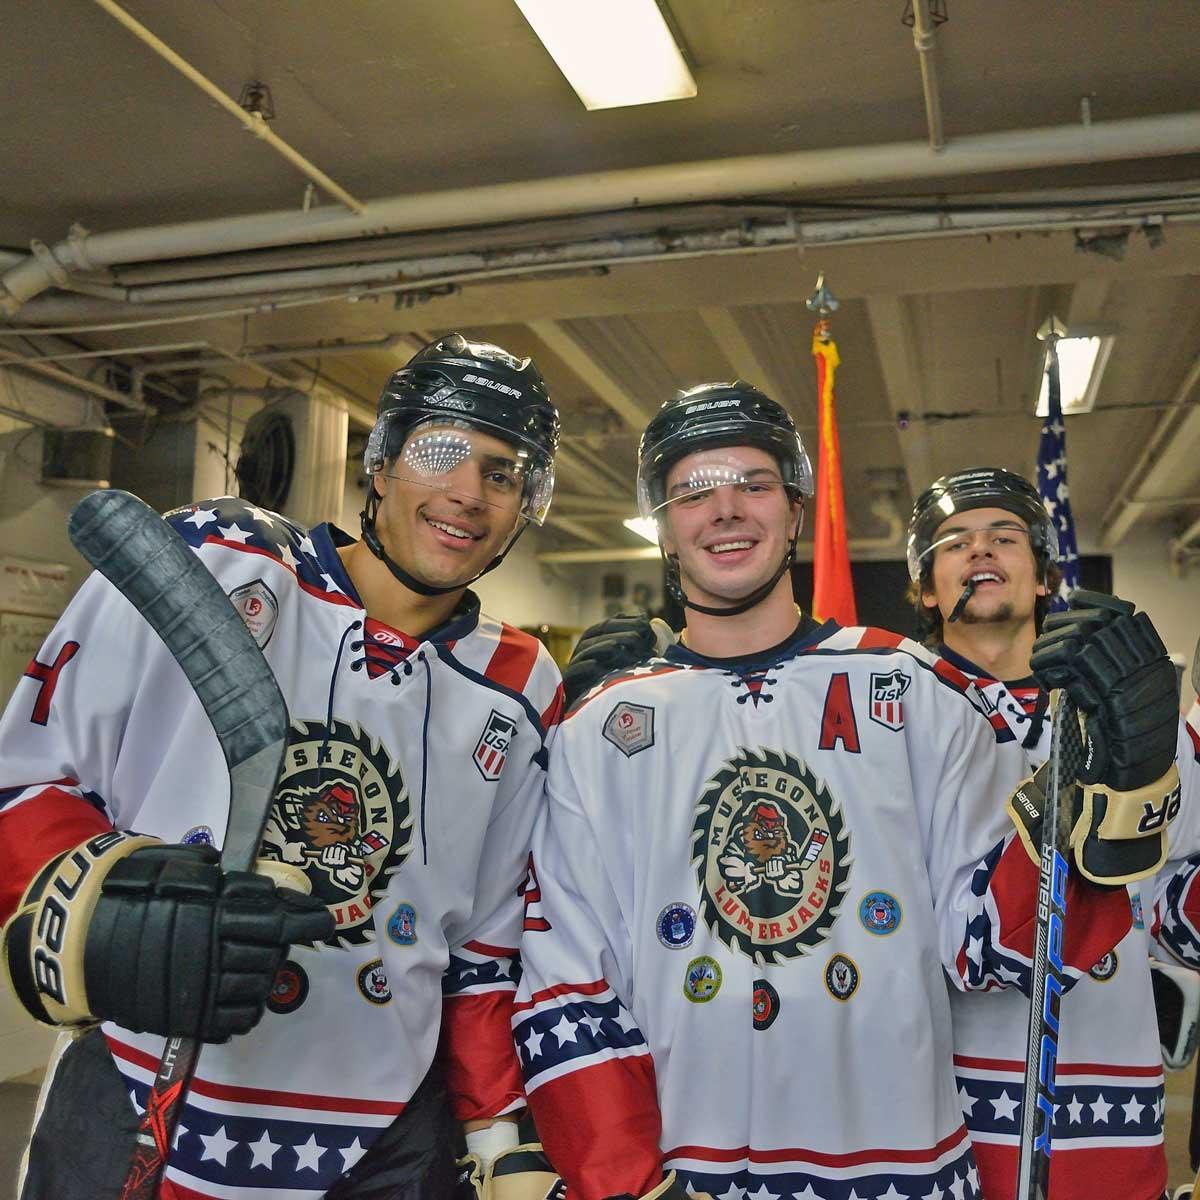 custom hockey uniforms